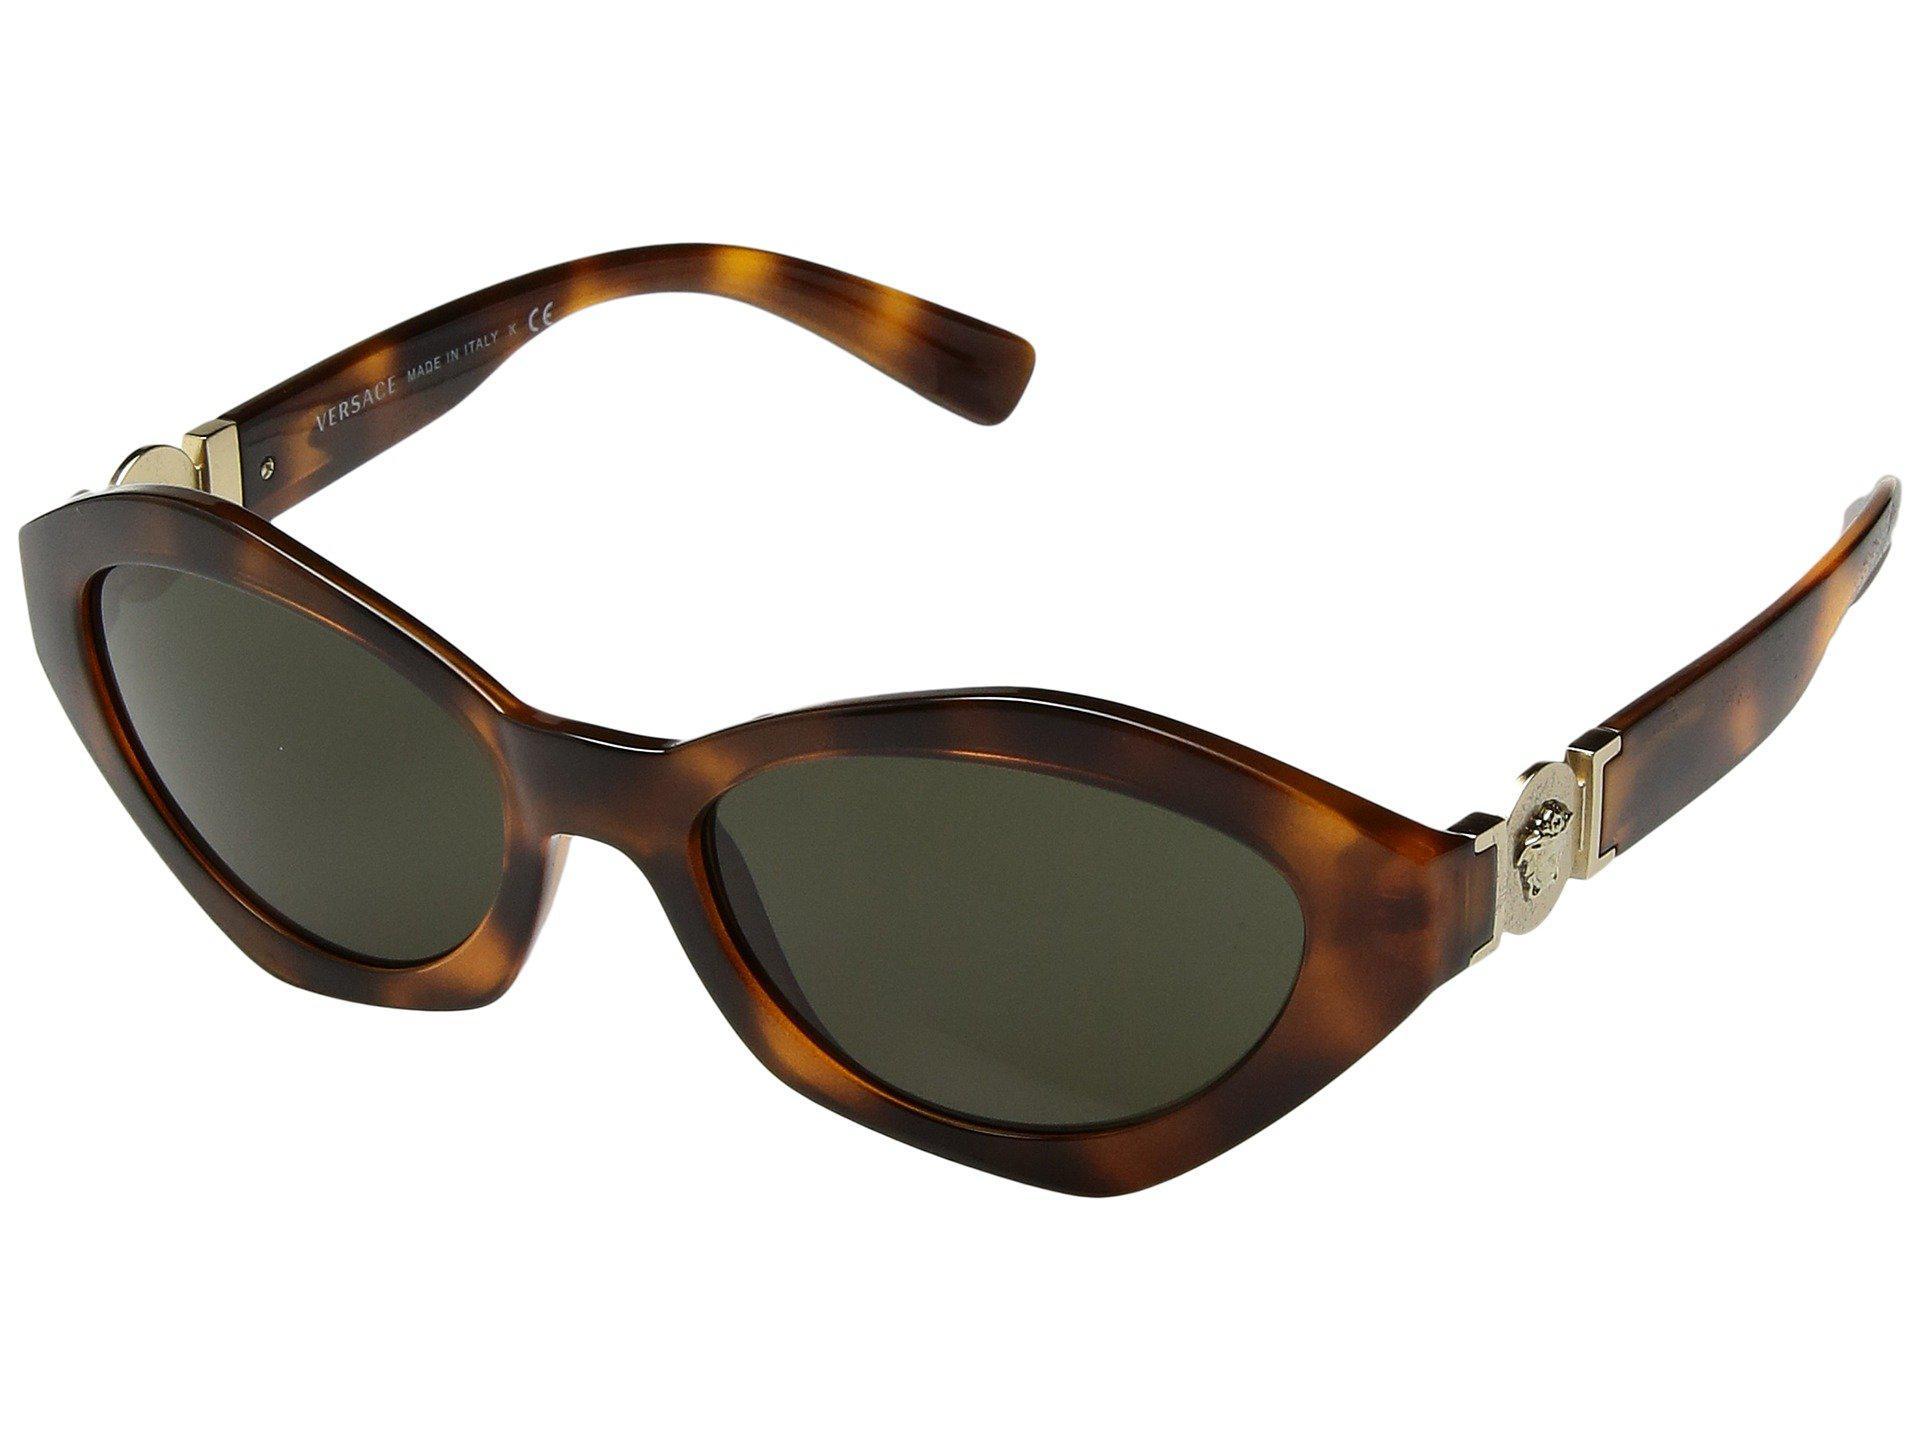 e3e03db5604d Lyst - Versace Ve4334 (havana/green) Fashion Sunglasses